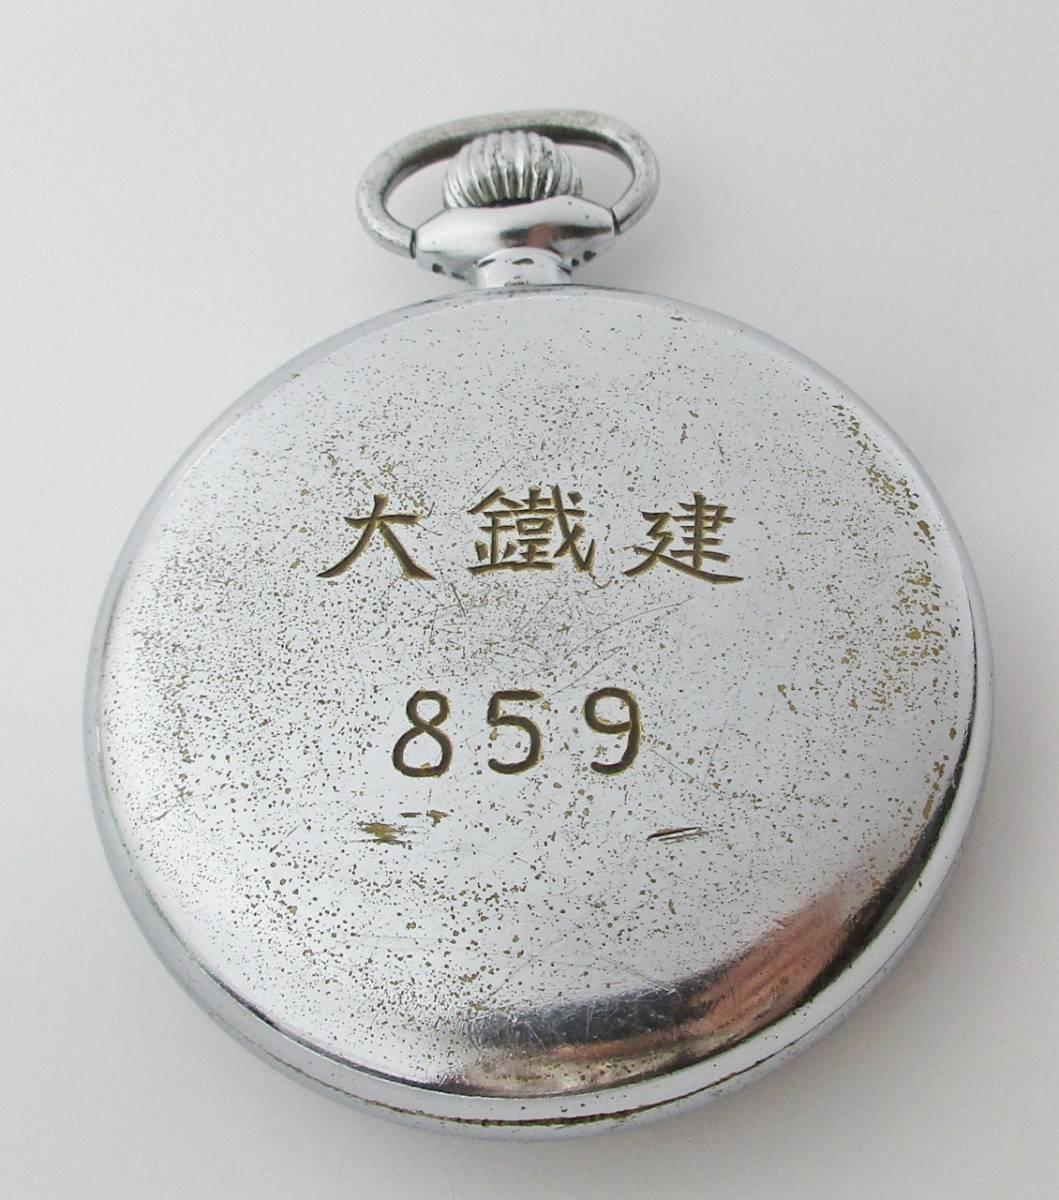 SEIKOSHA 精工舎 中三針 鉄道時計 飛行時計 鉄道局 国鉄 オーバーホール済_画像3